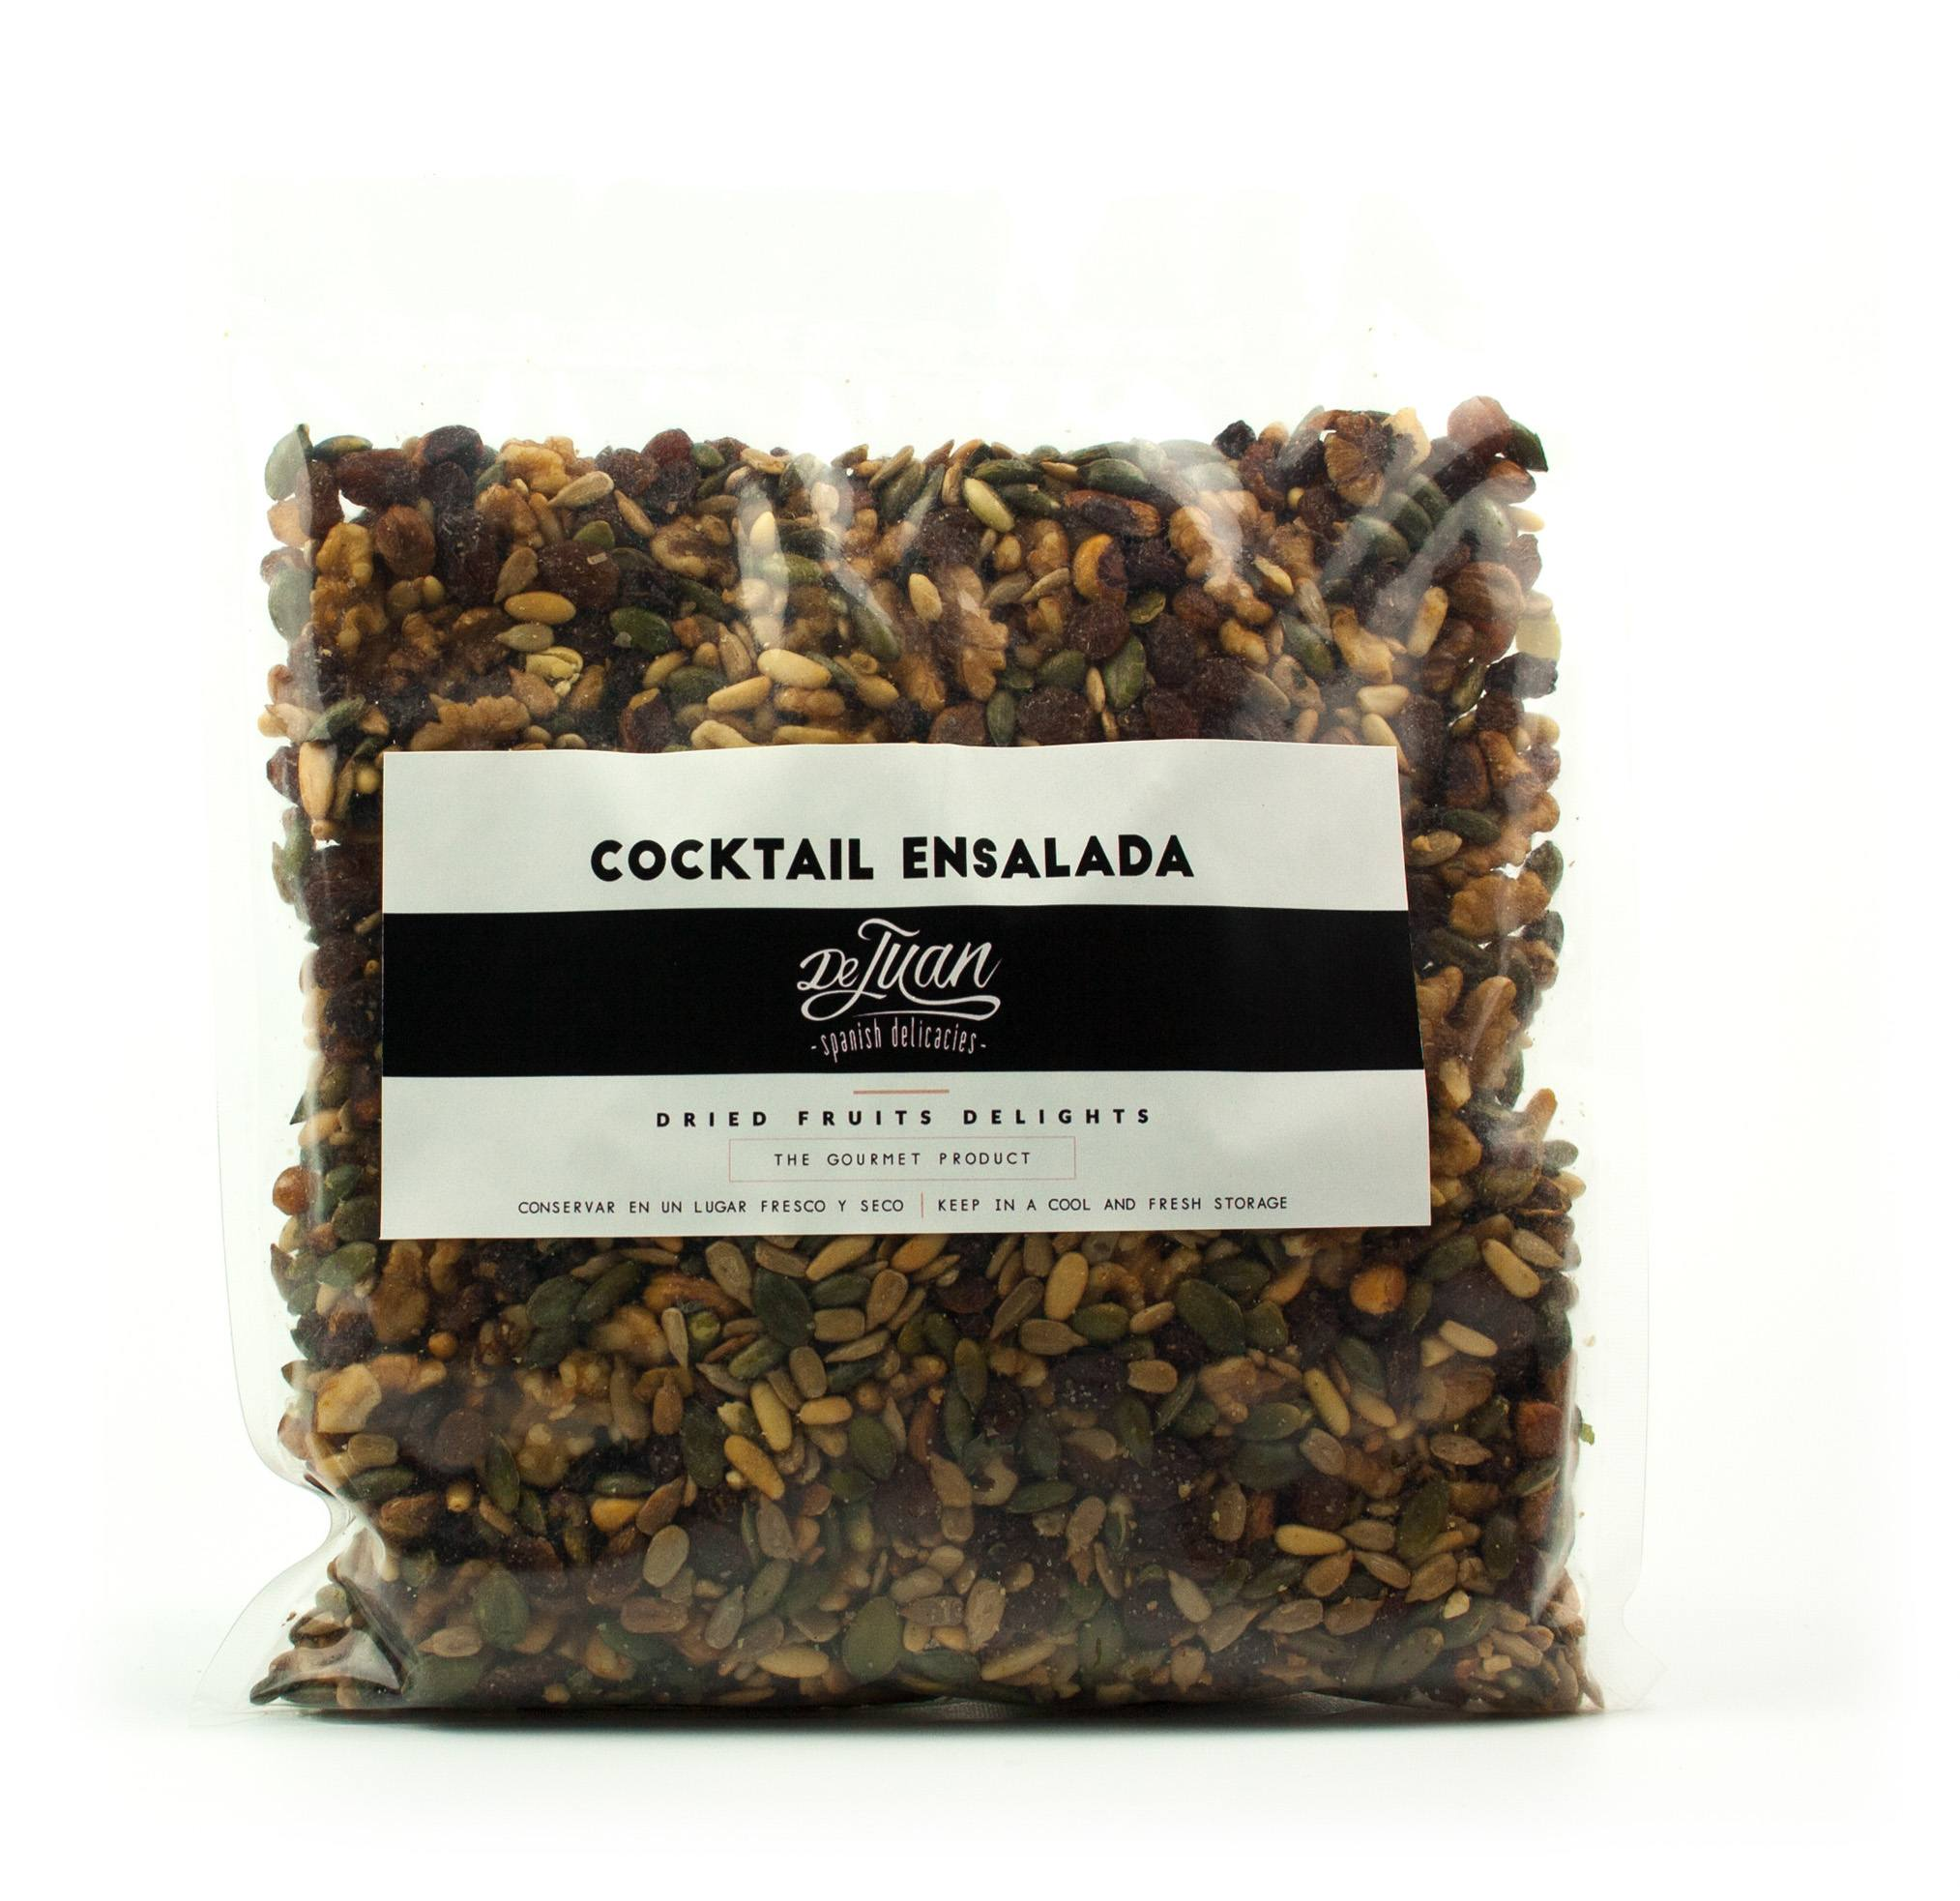 Saco de Cocktail de Ensalada